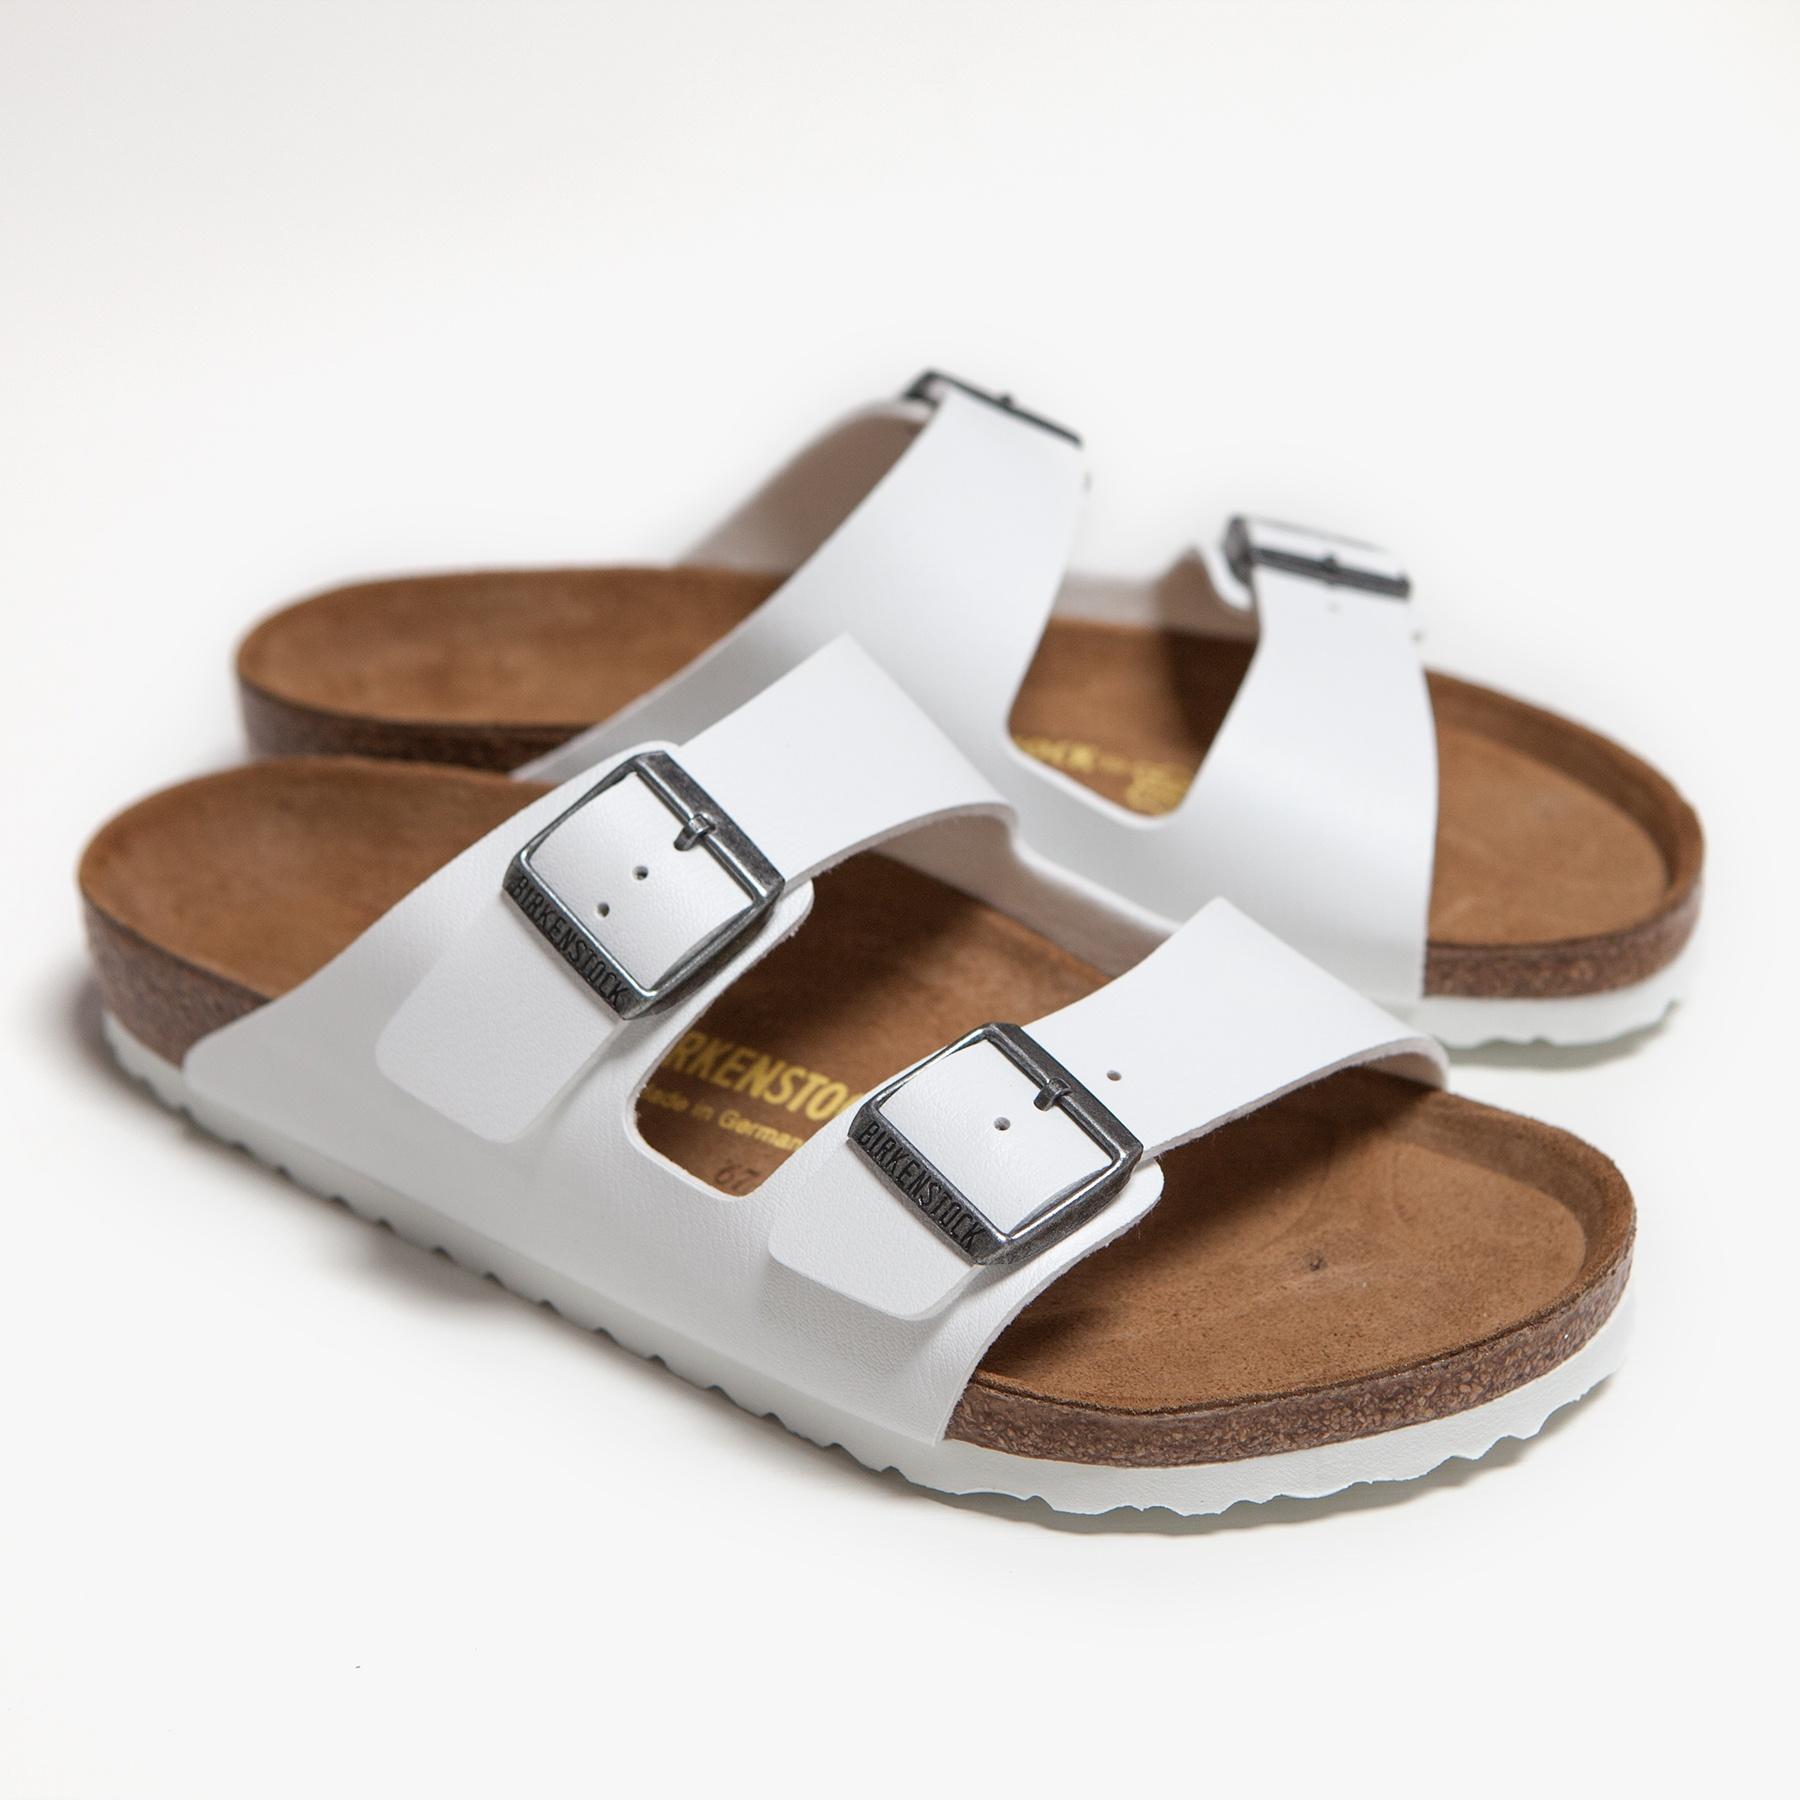 Lyst James Perse Birkenstock Arizona Sandal Womens In White